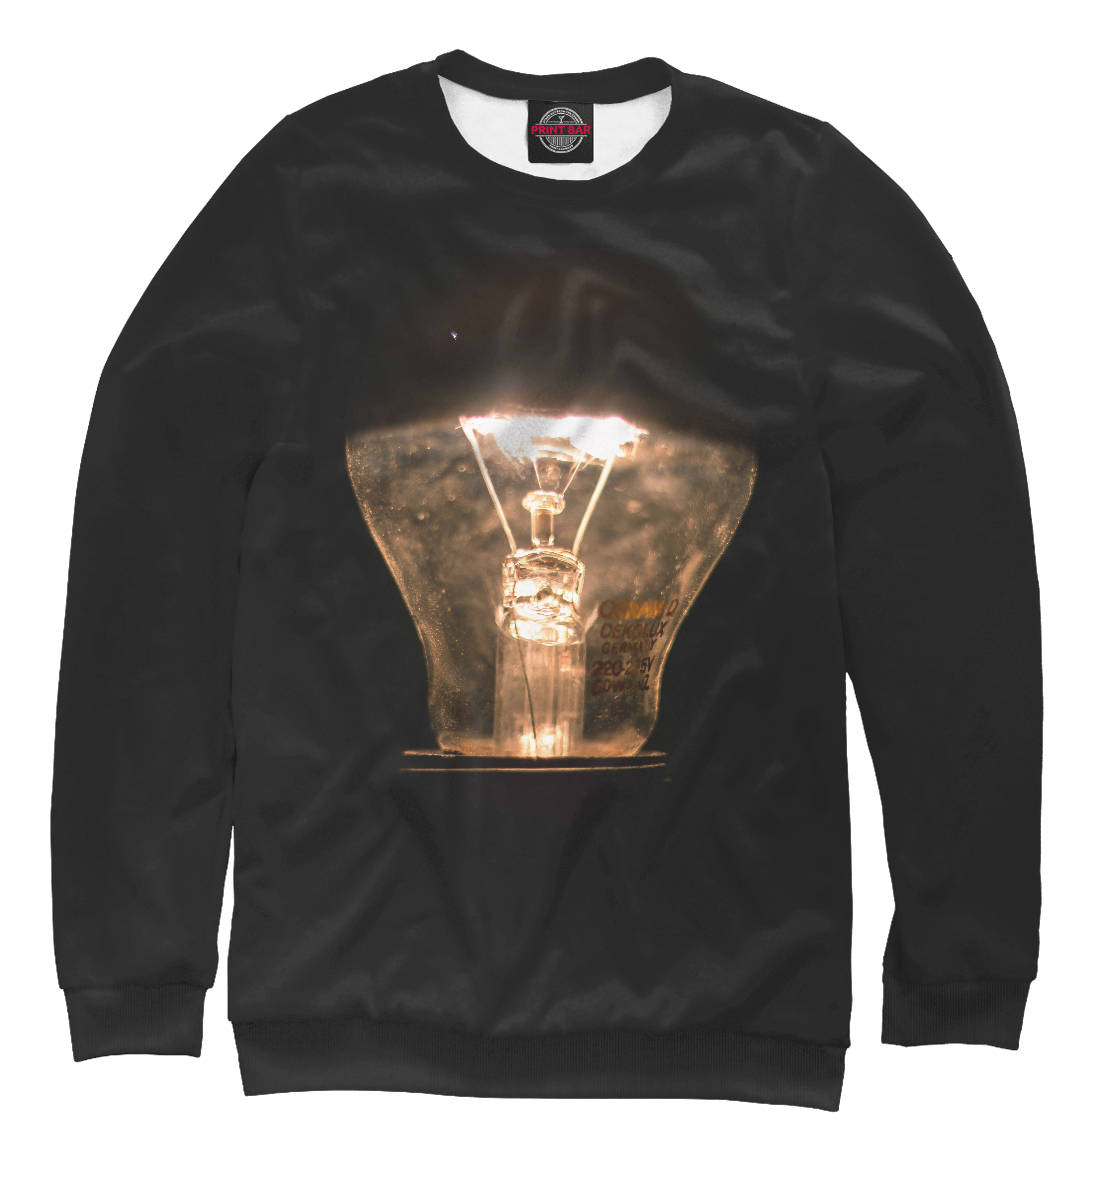 Купить Лампочка, Printbar, Свитшоты, APD-886084-swi-2